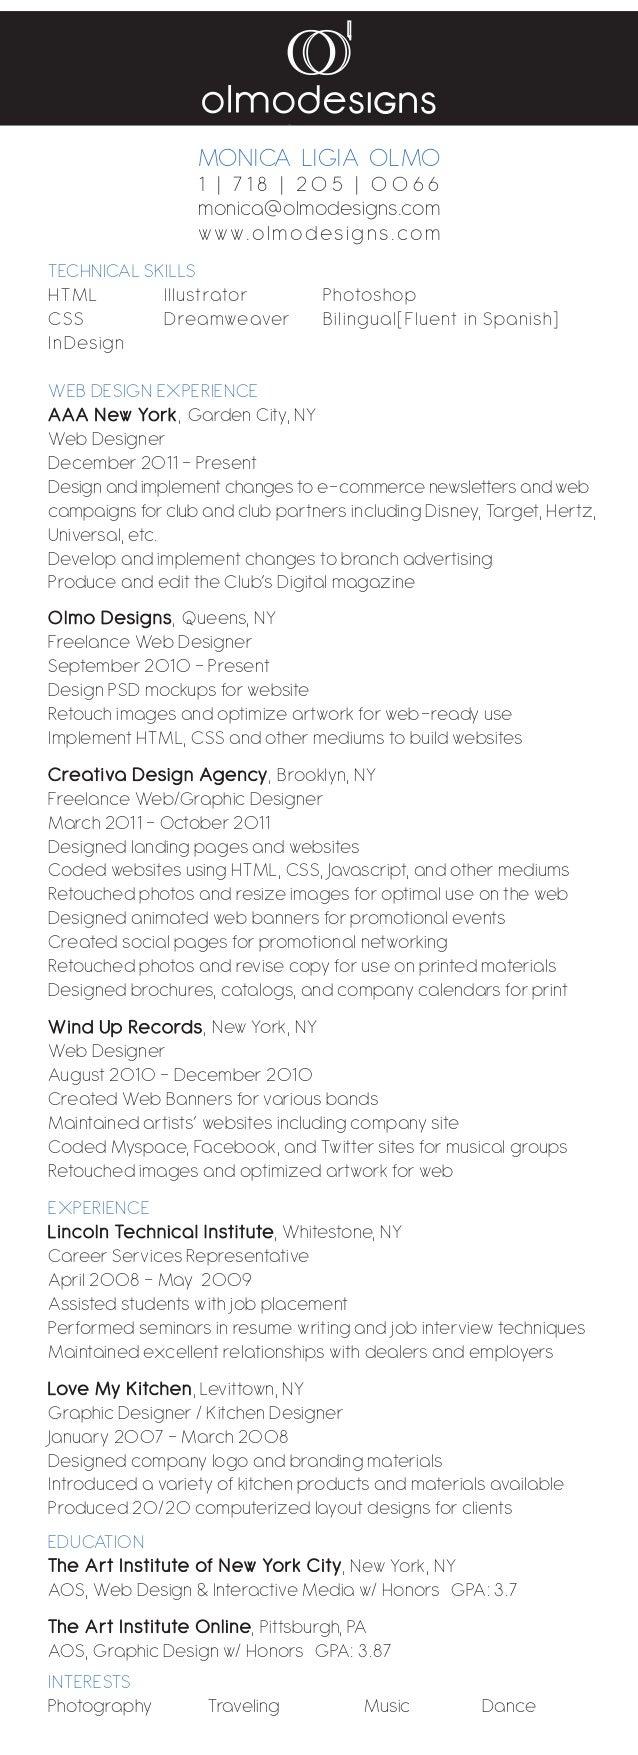 technical skills html illustrator photoshop css dreamweaver bilingualfluent in spanish indesign web design - Ww Ecommerce Ny